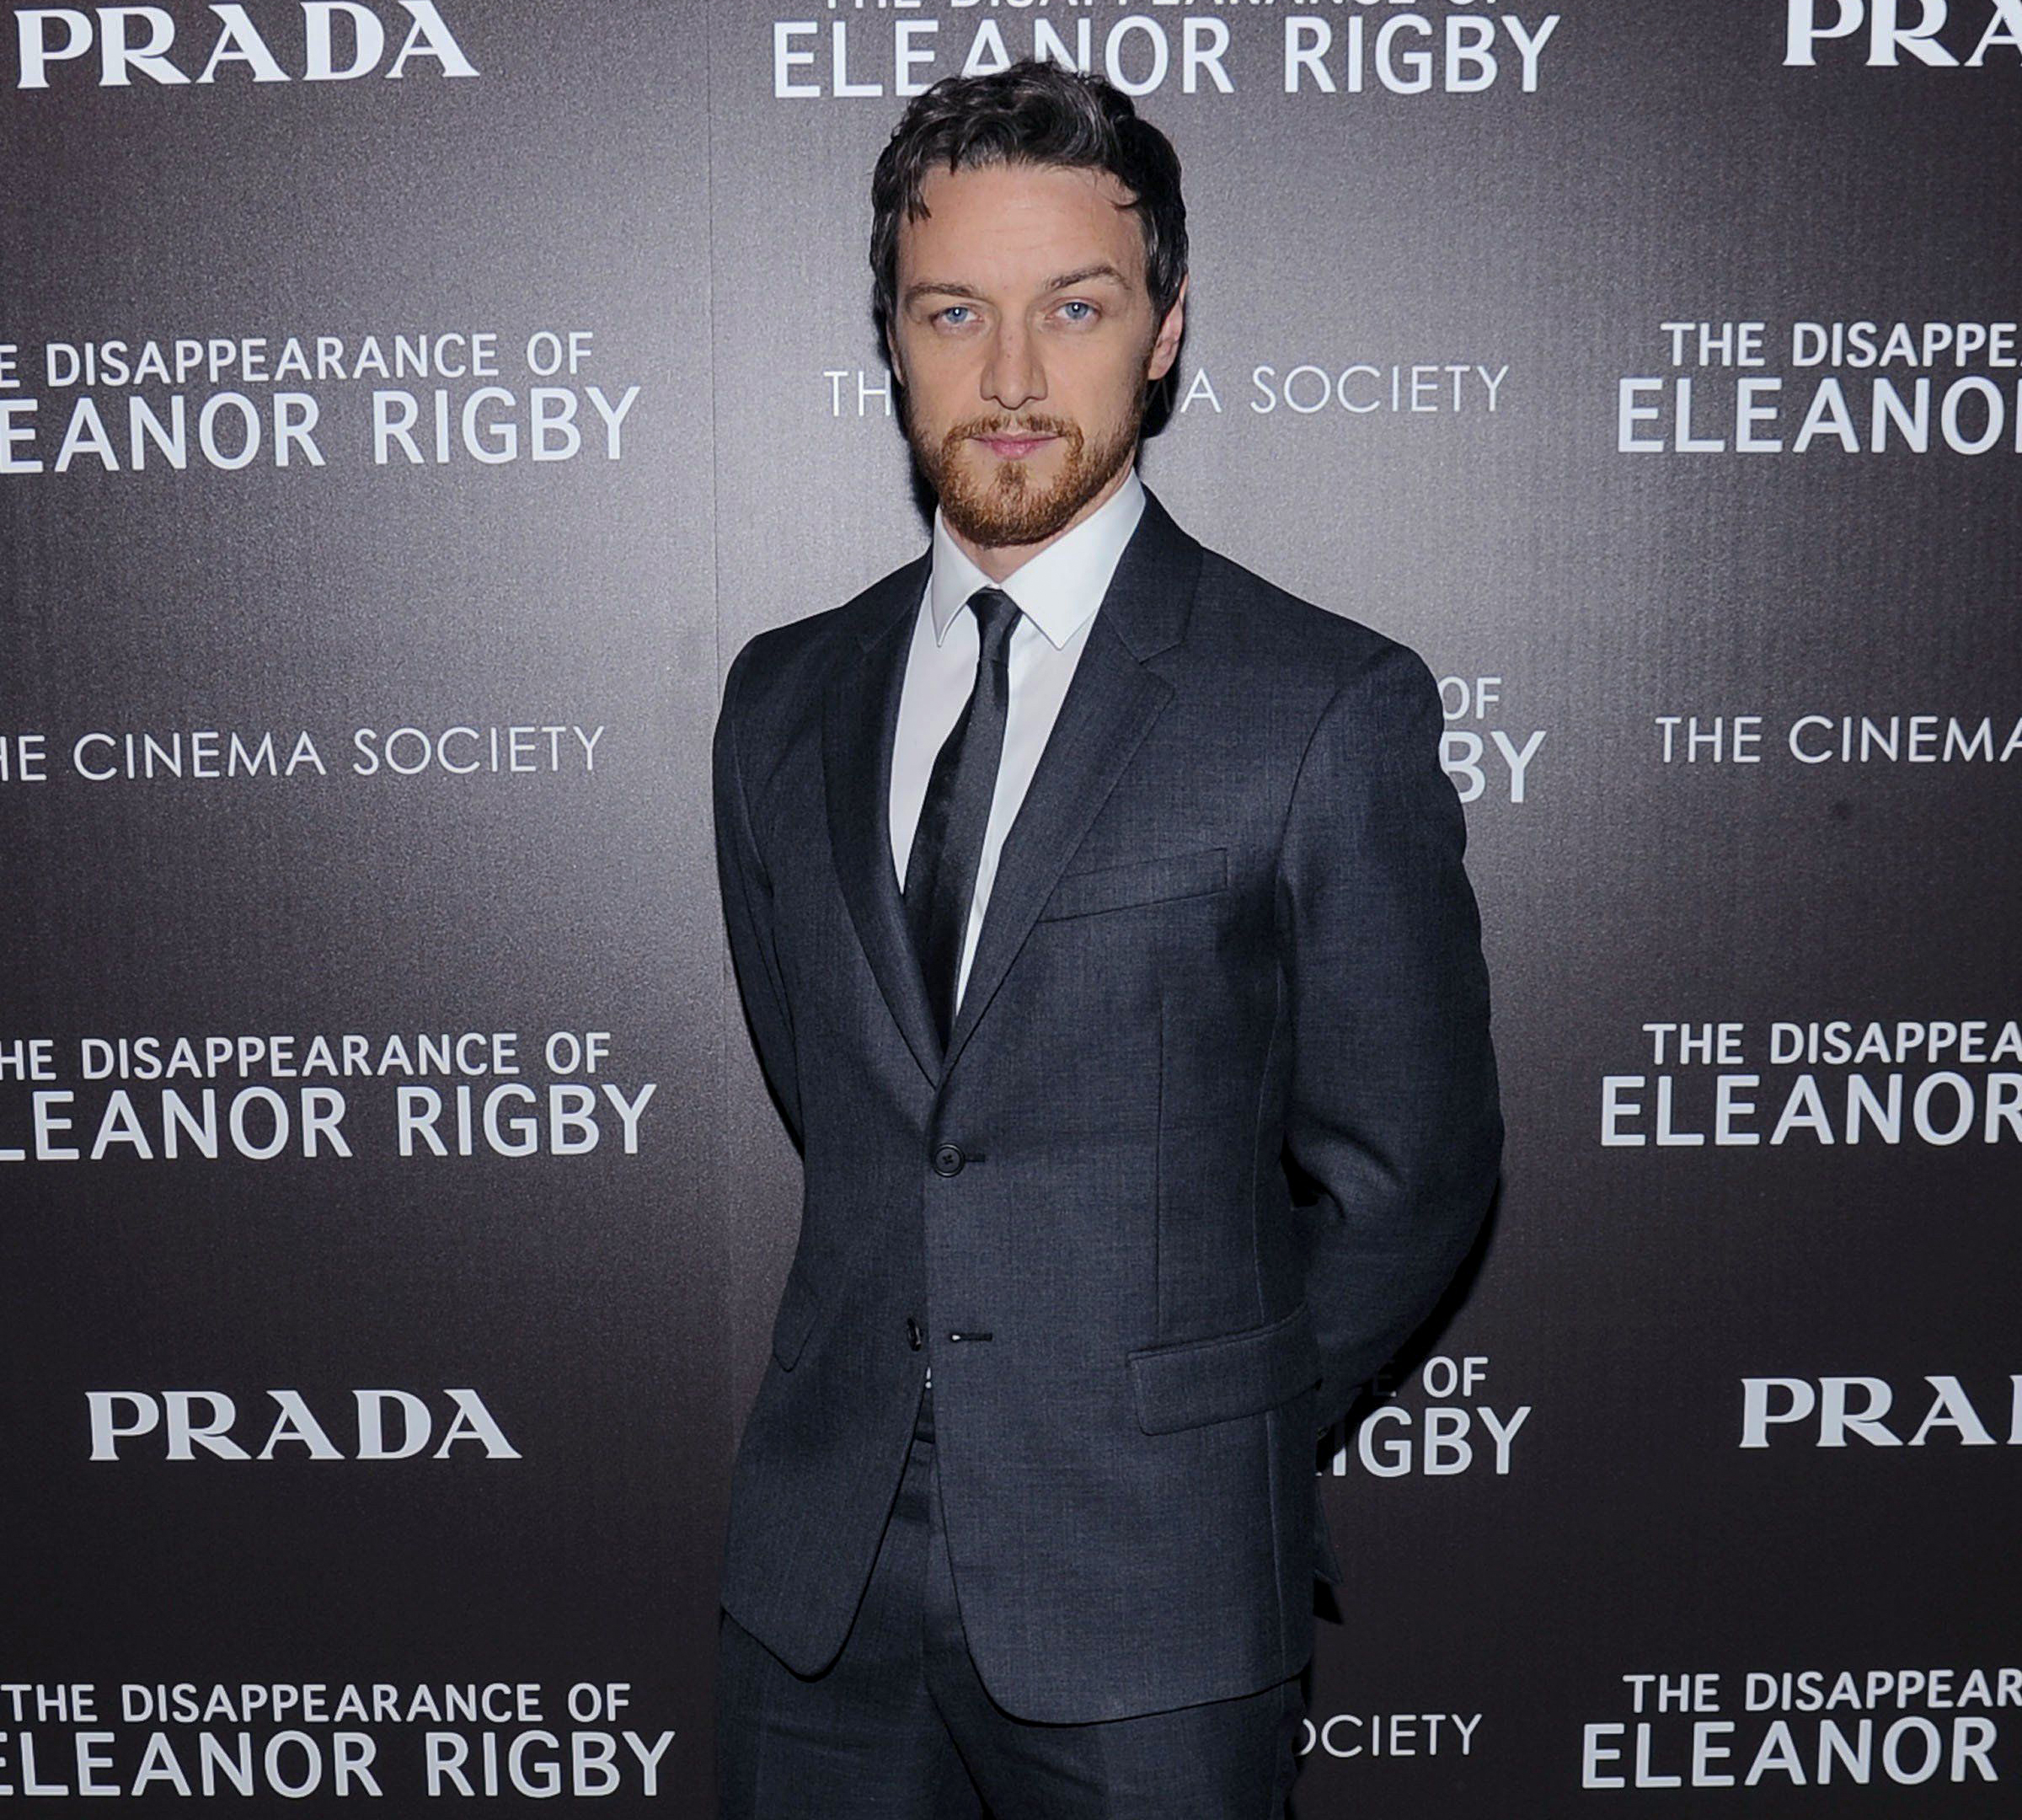 James McAvoy wears a Prada suit